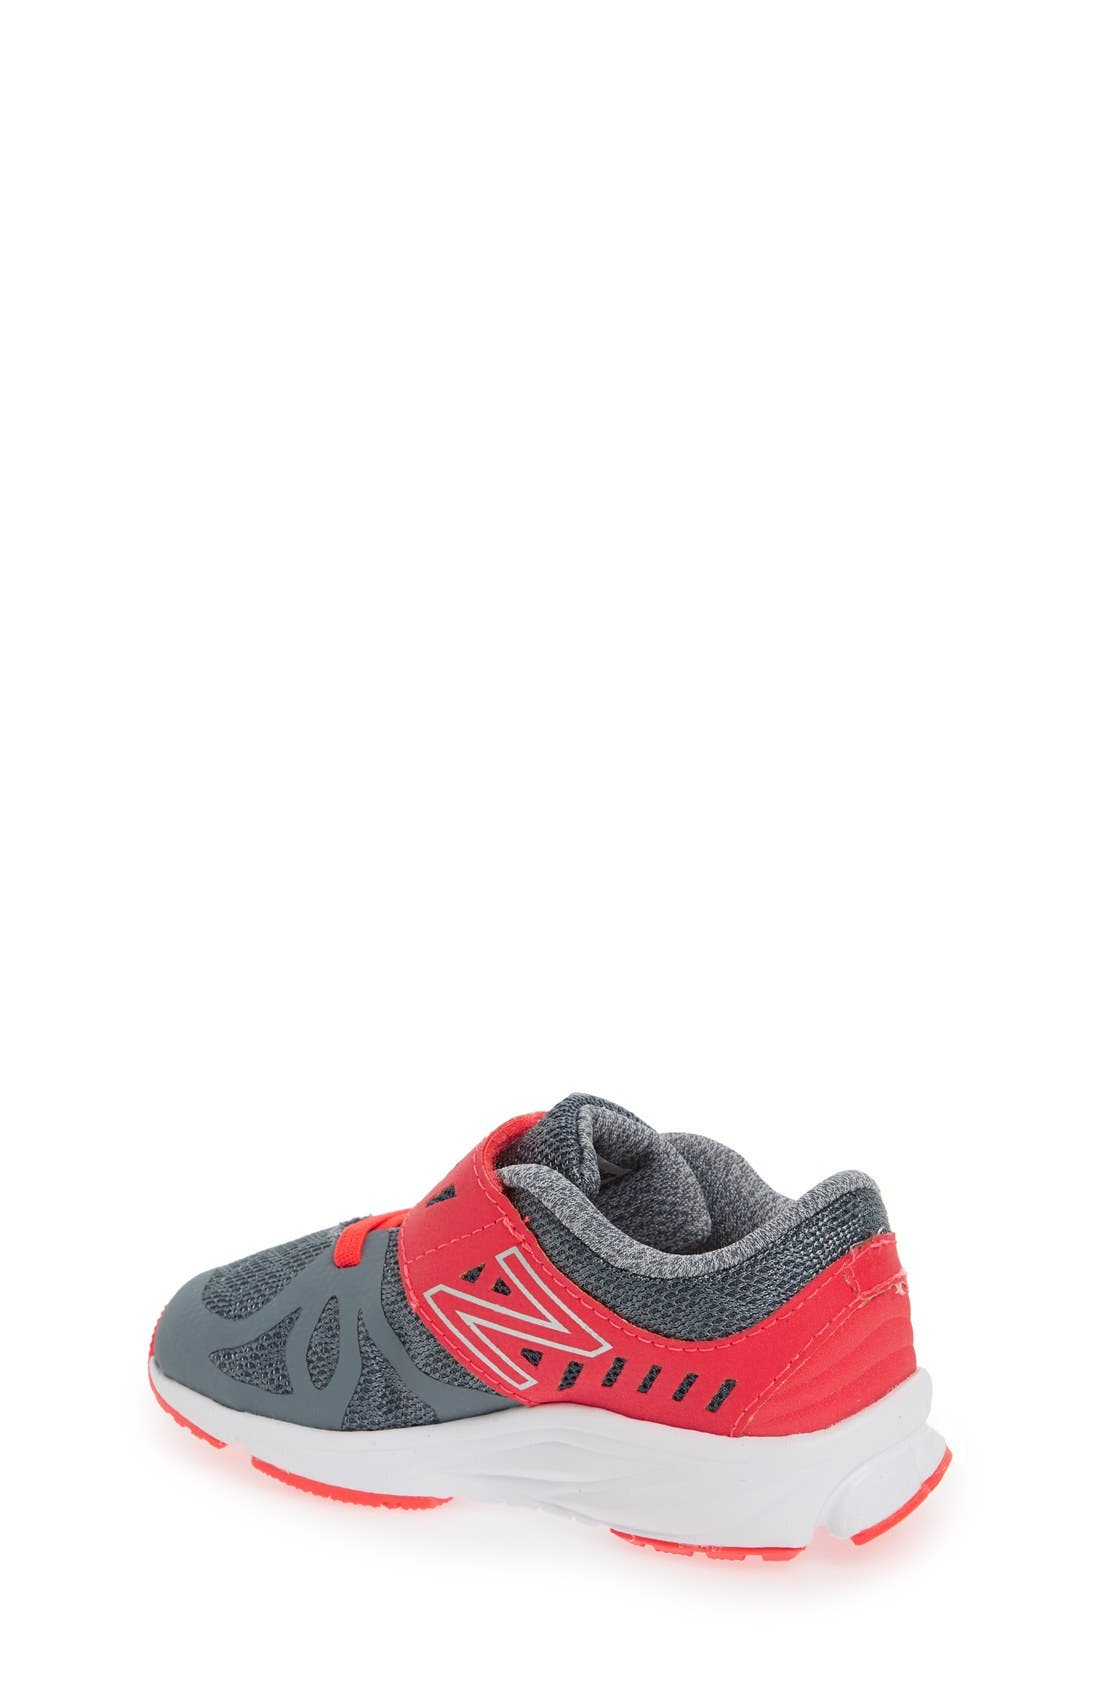 'Vazee Rush 200' Athletic Shoe,                             Alternate thumbnail 9, color,